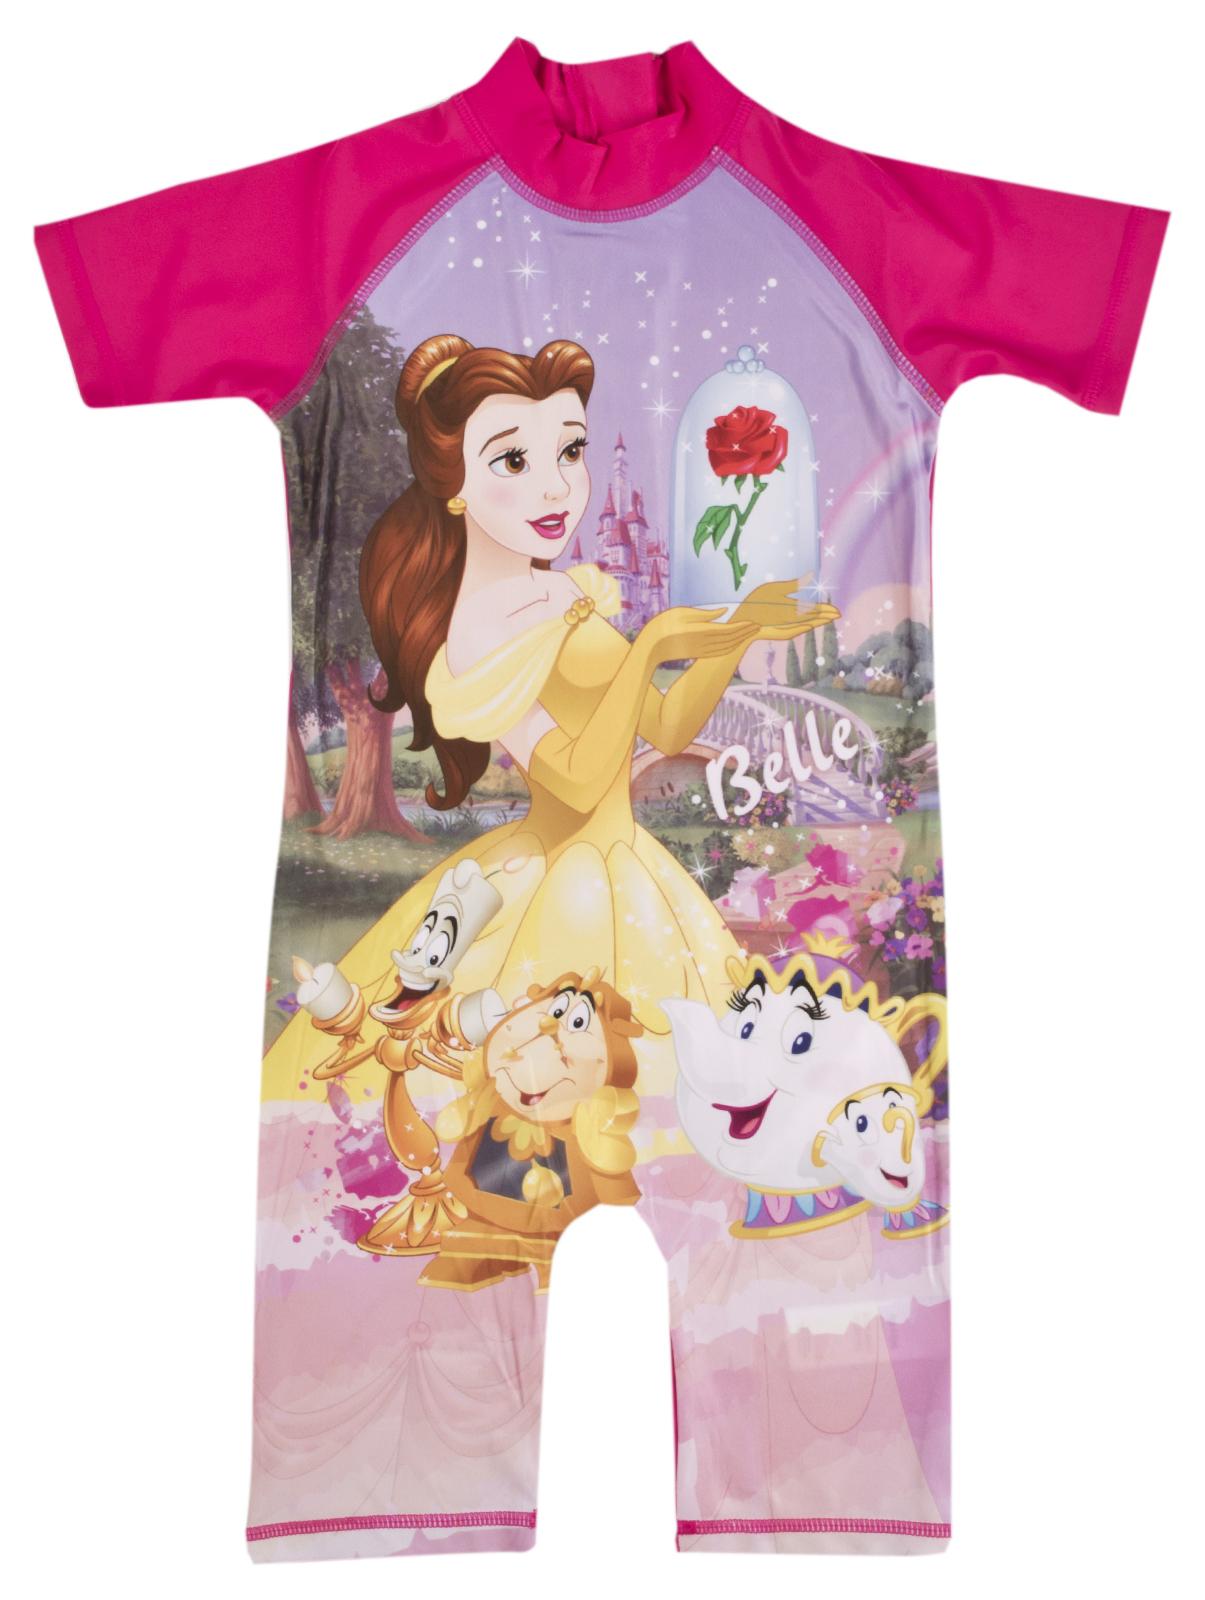 Disney Princess Belle Sun Suit Girls Beach Holiday Surf Suit Costume Kids Size